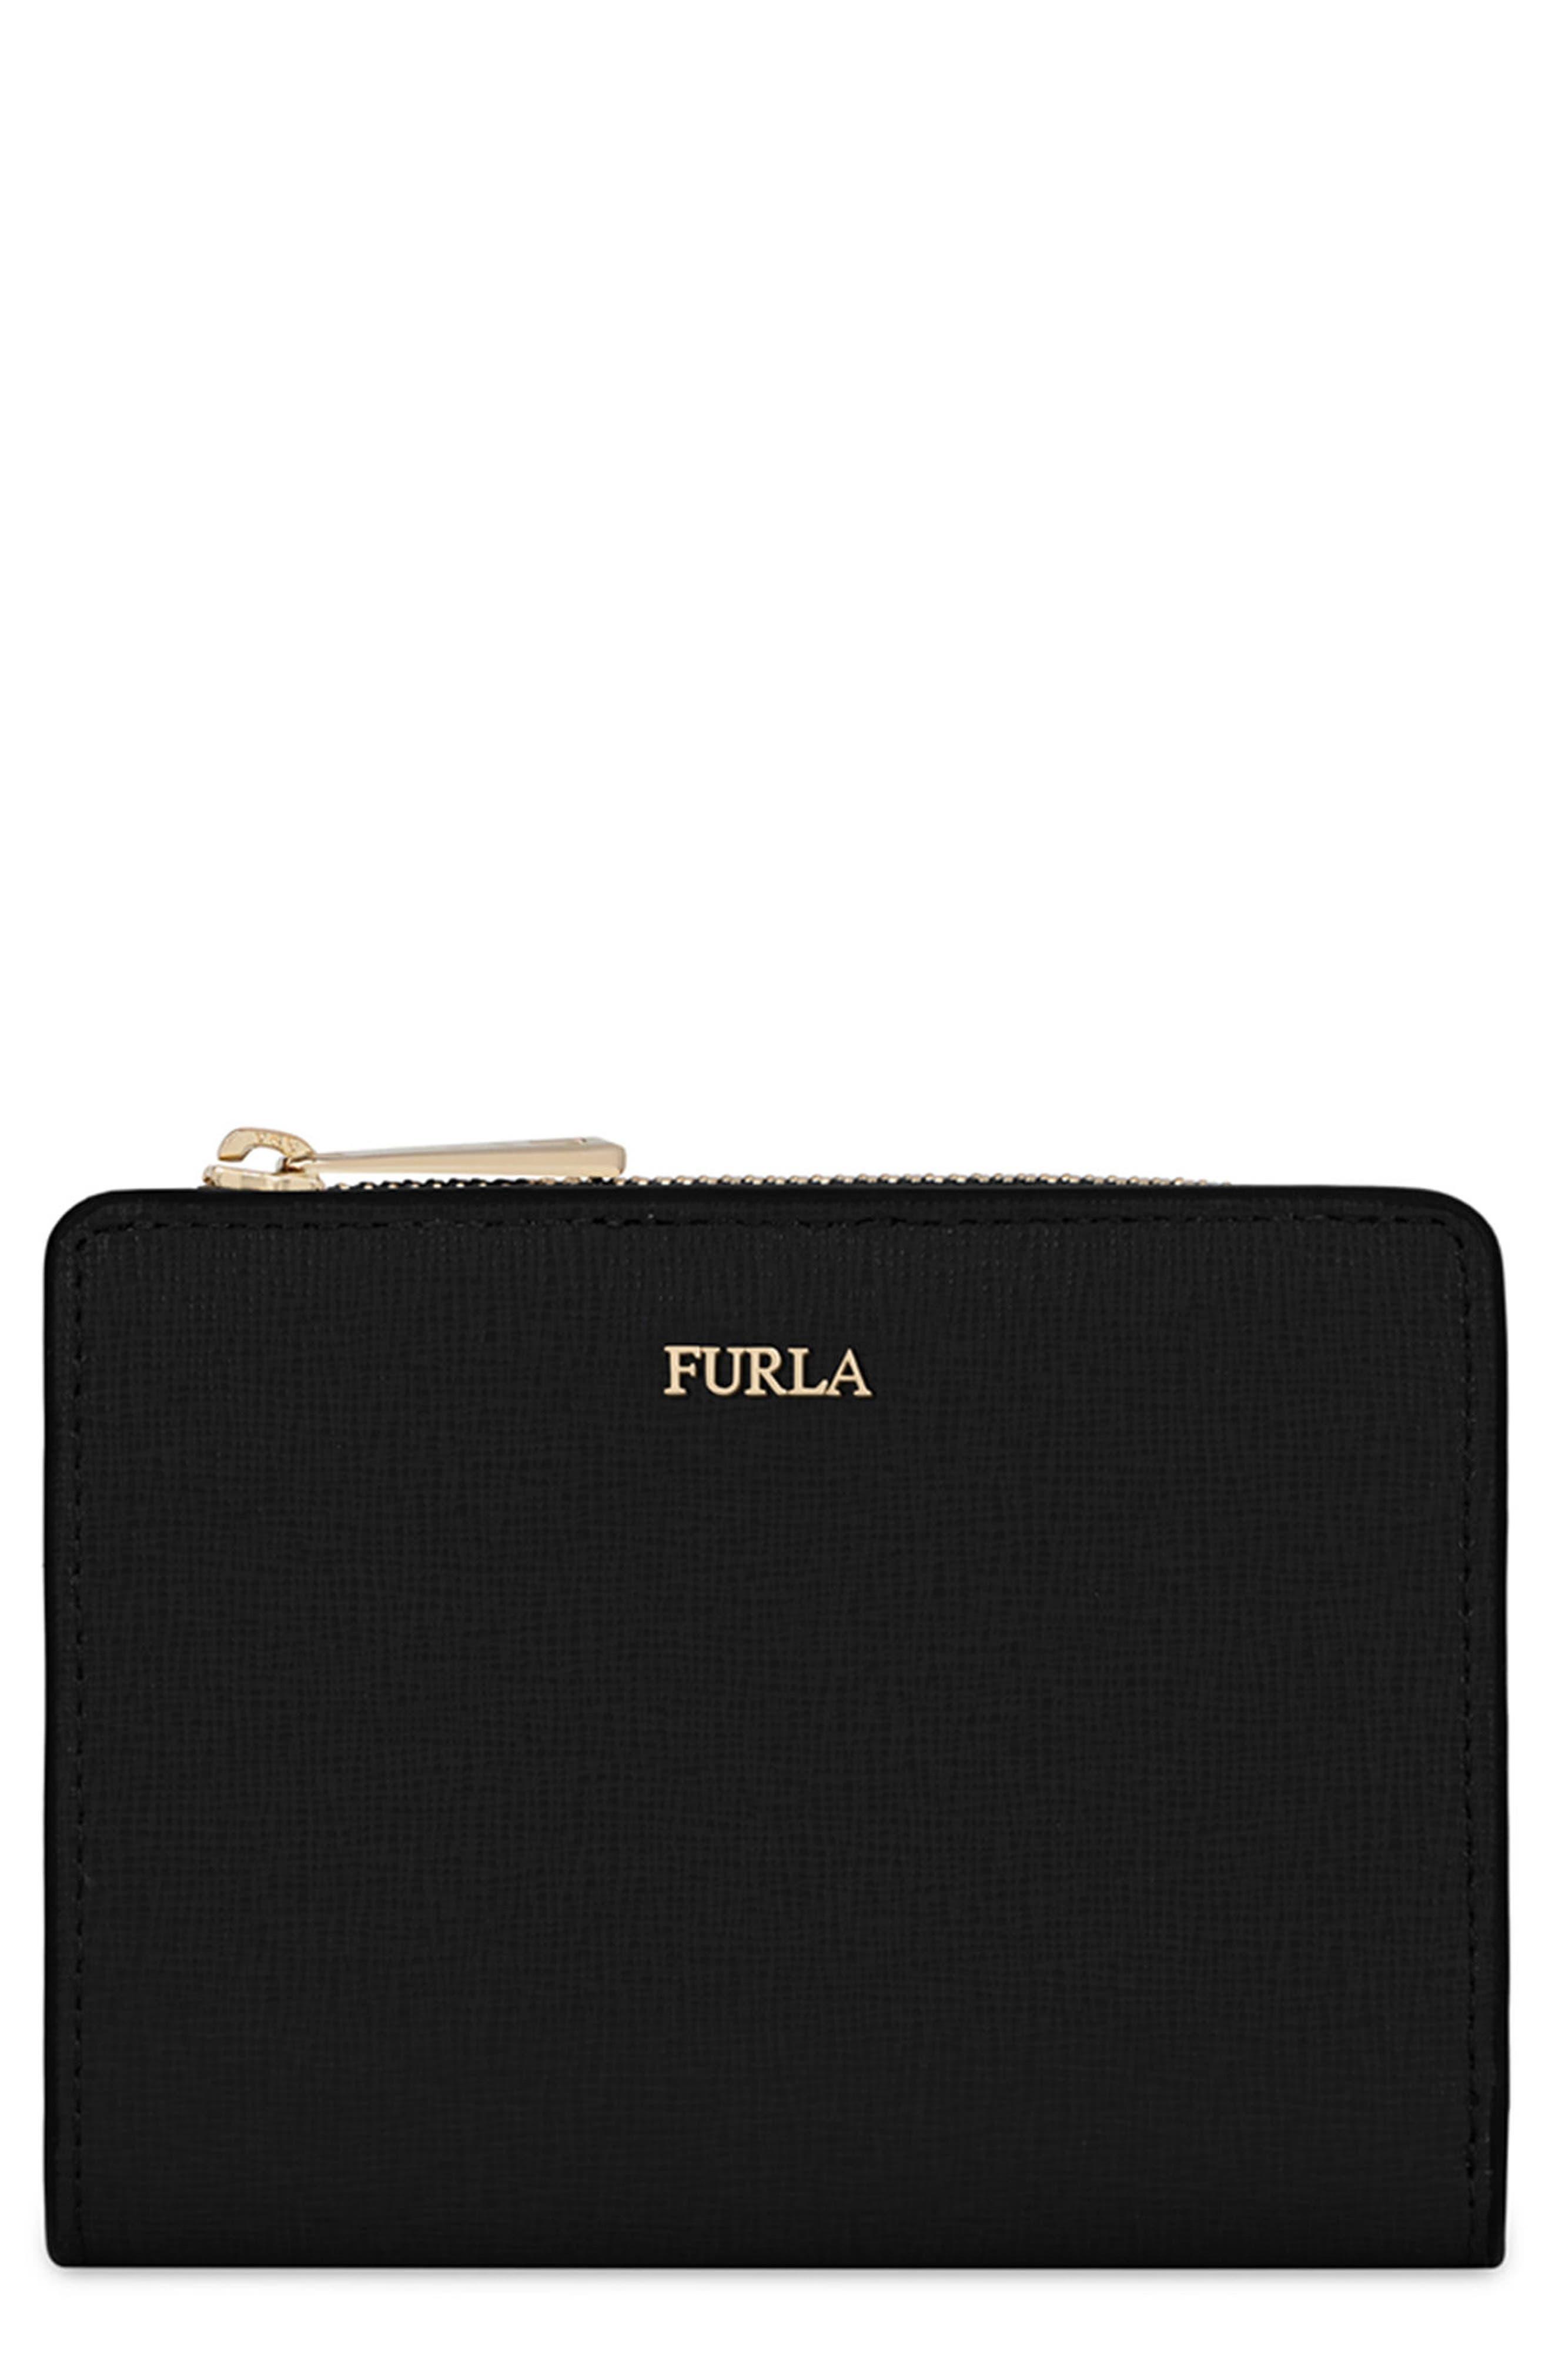 Furla Small Babylon Saffiano Leather Zip Around Wallet